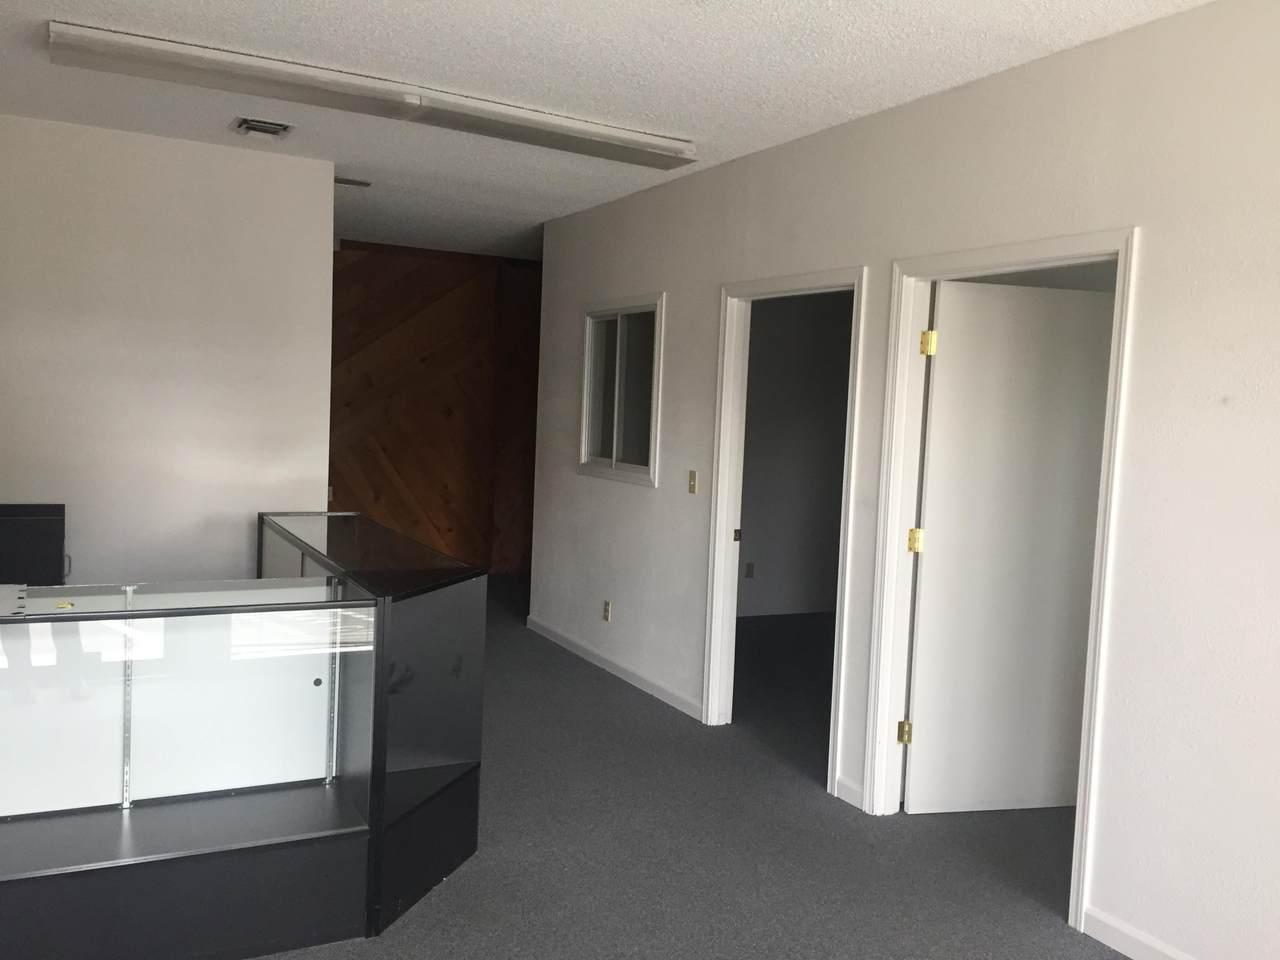 2690 Bechelli Lane, Suite A - Photo 1